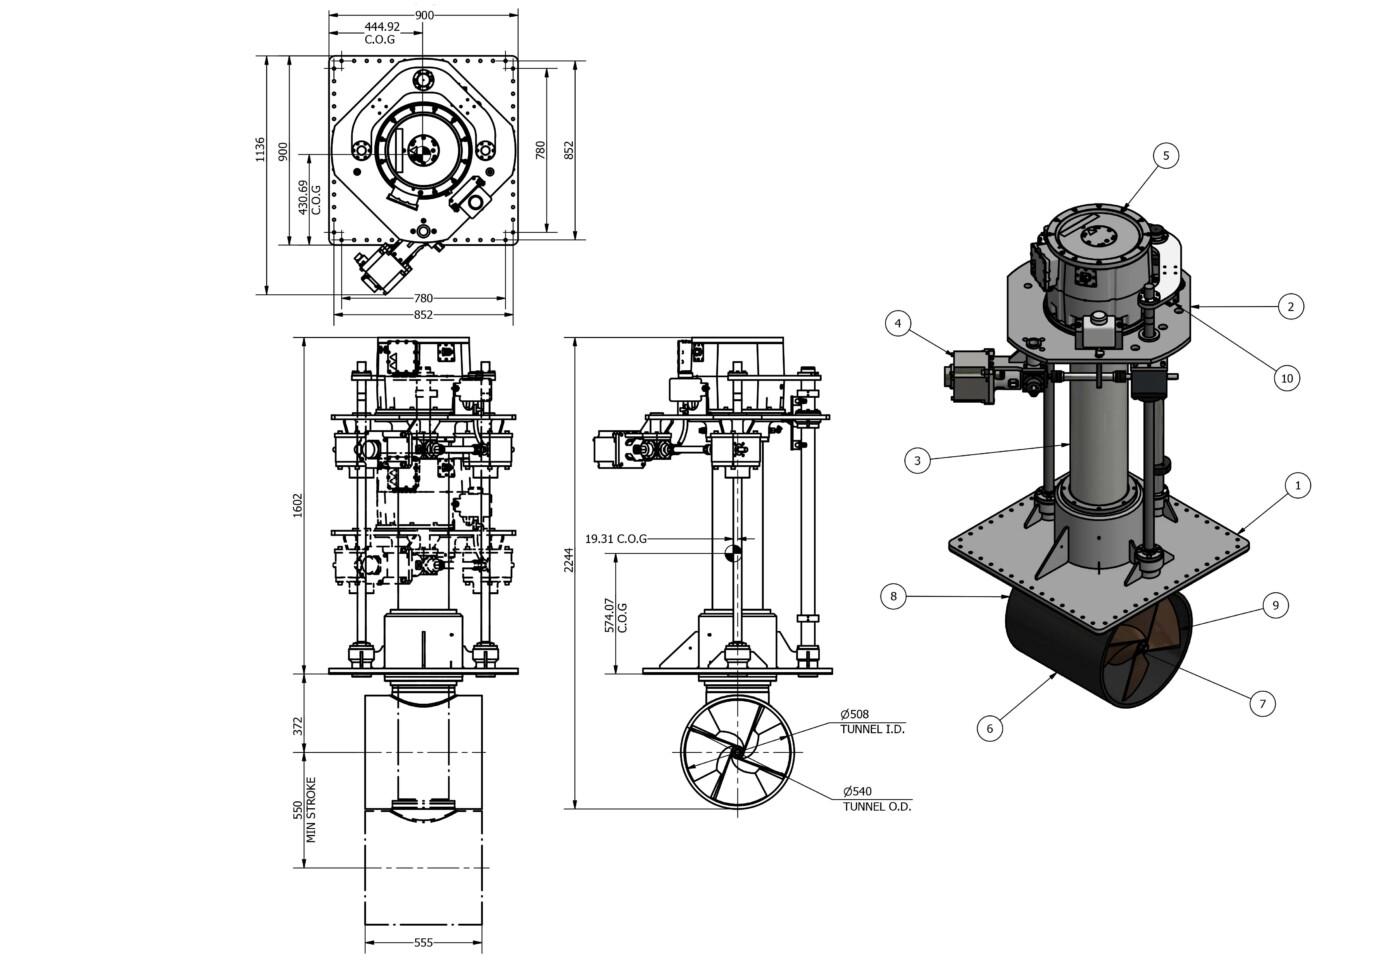 OMS Electrical Vertical Thruster E-0500-V